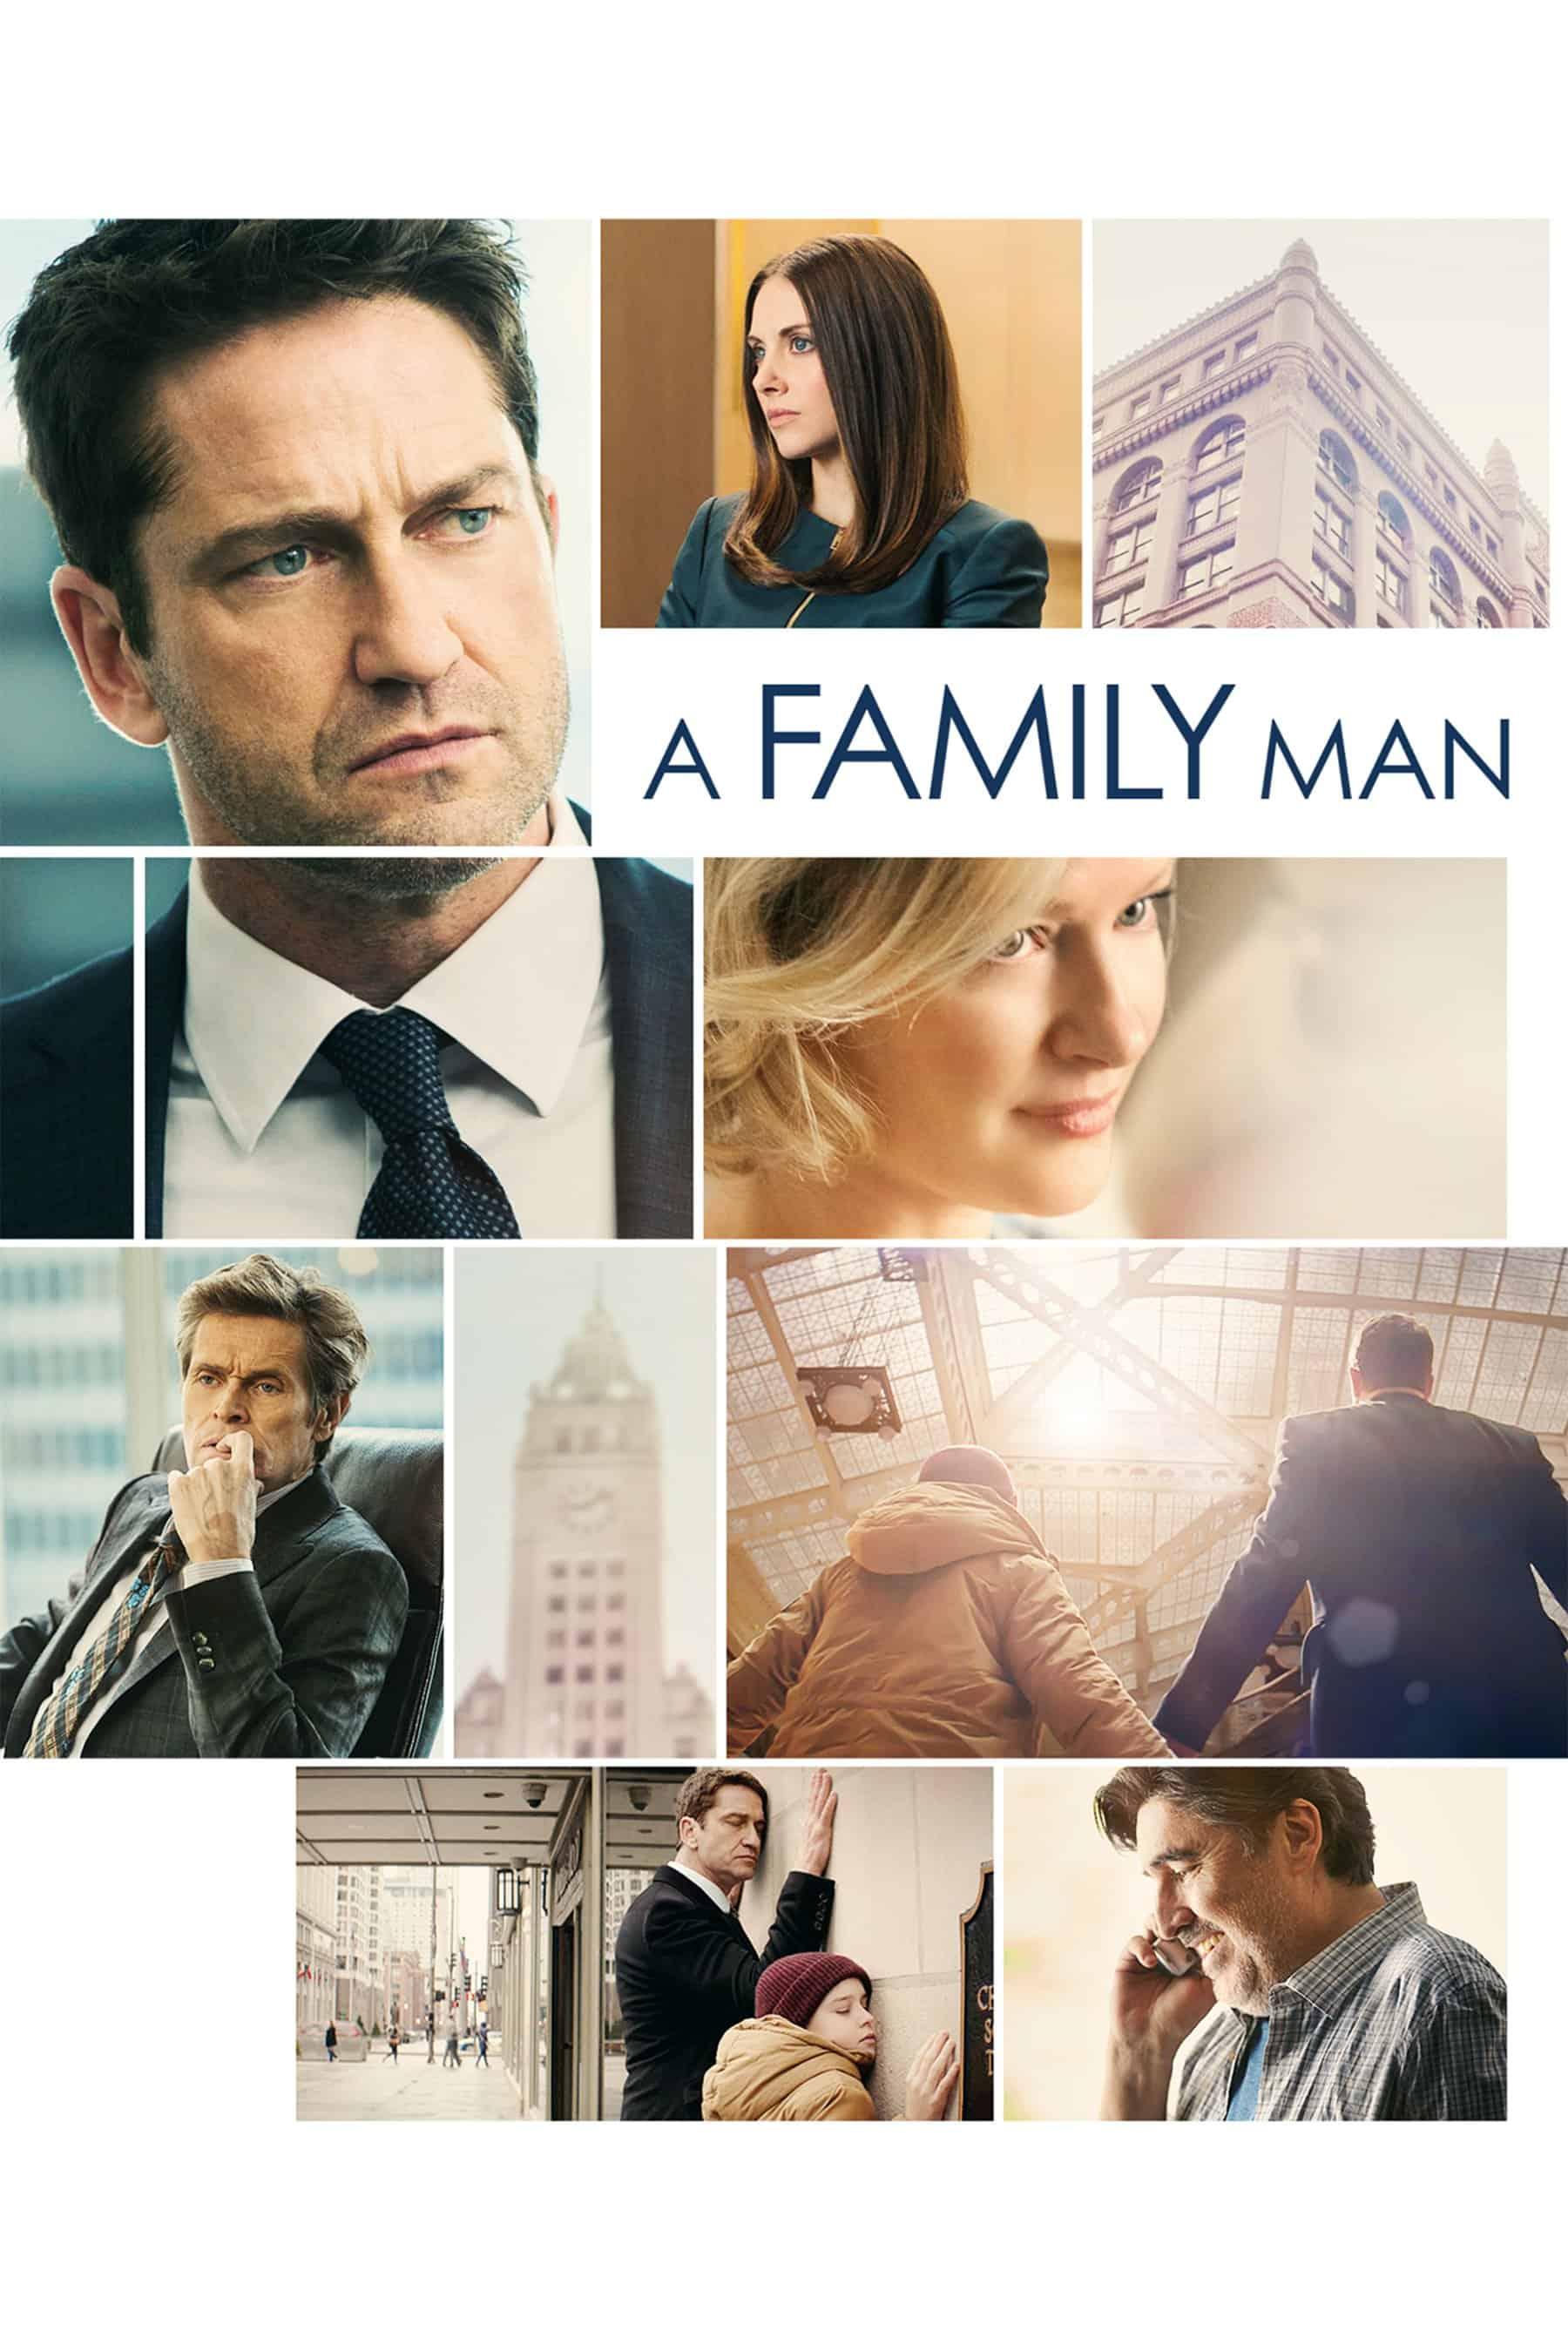 A Family Man, 2016